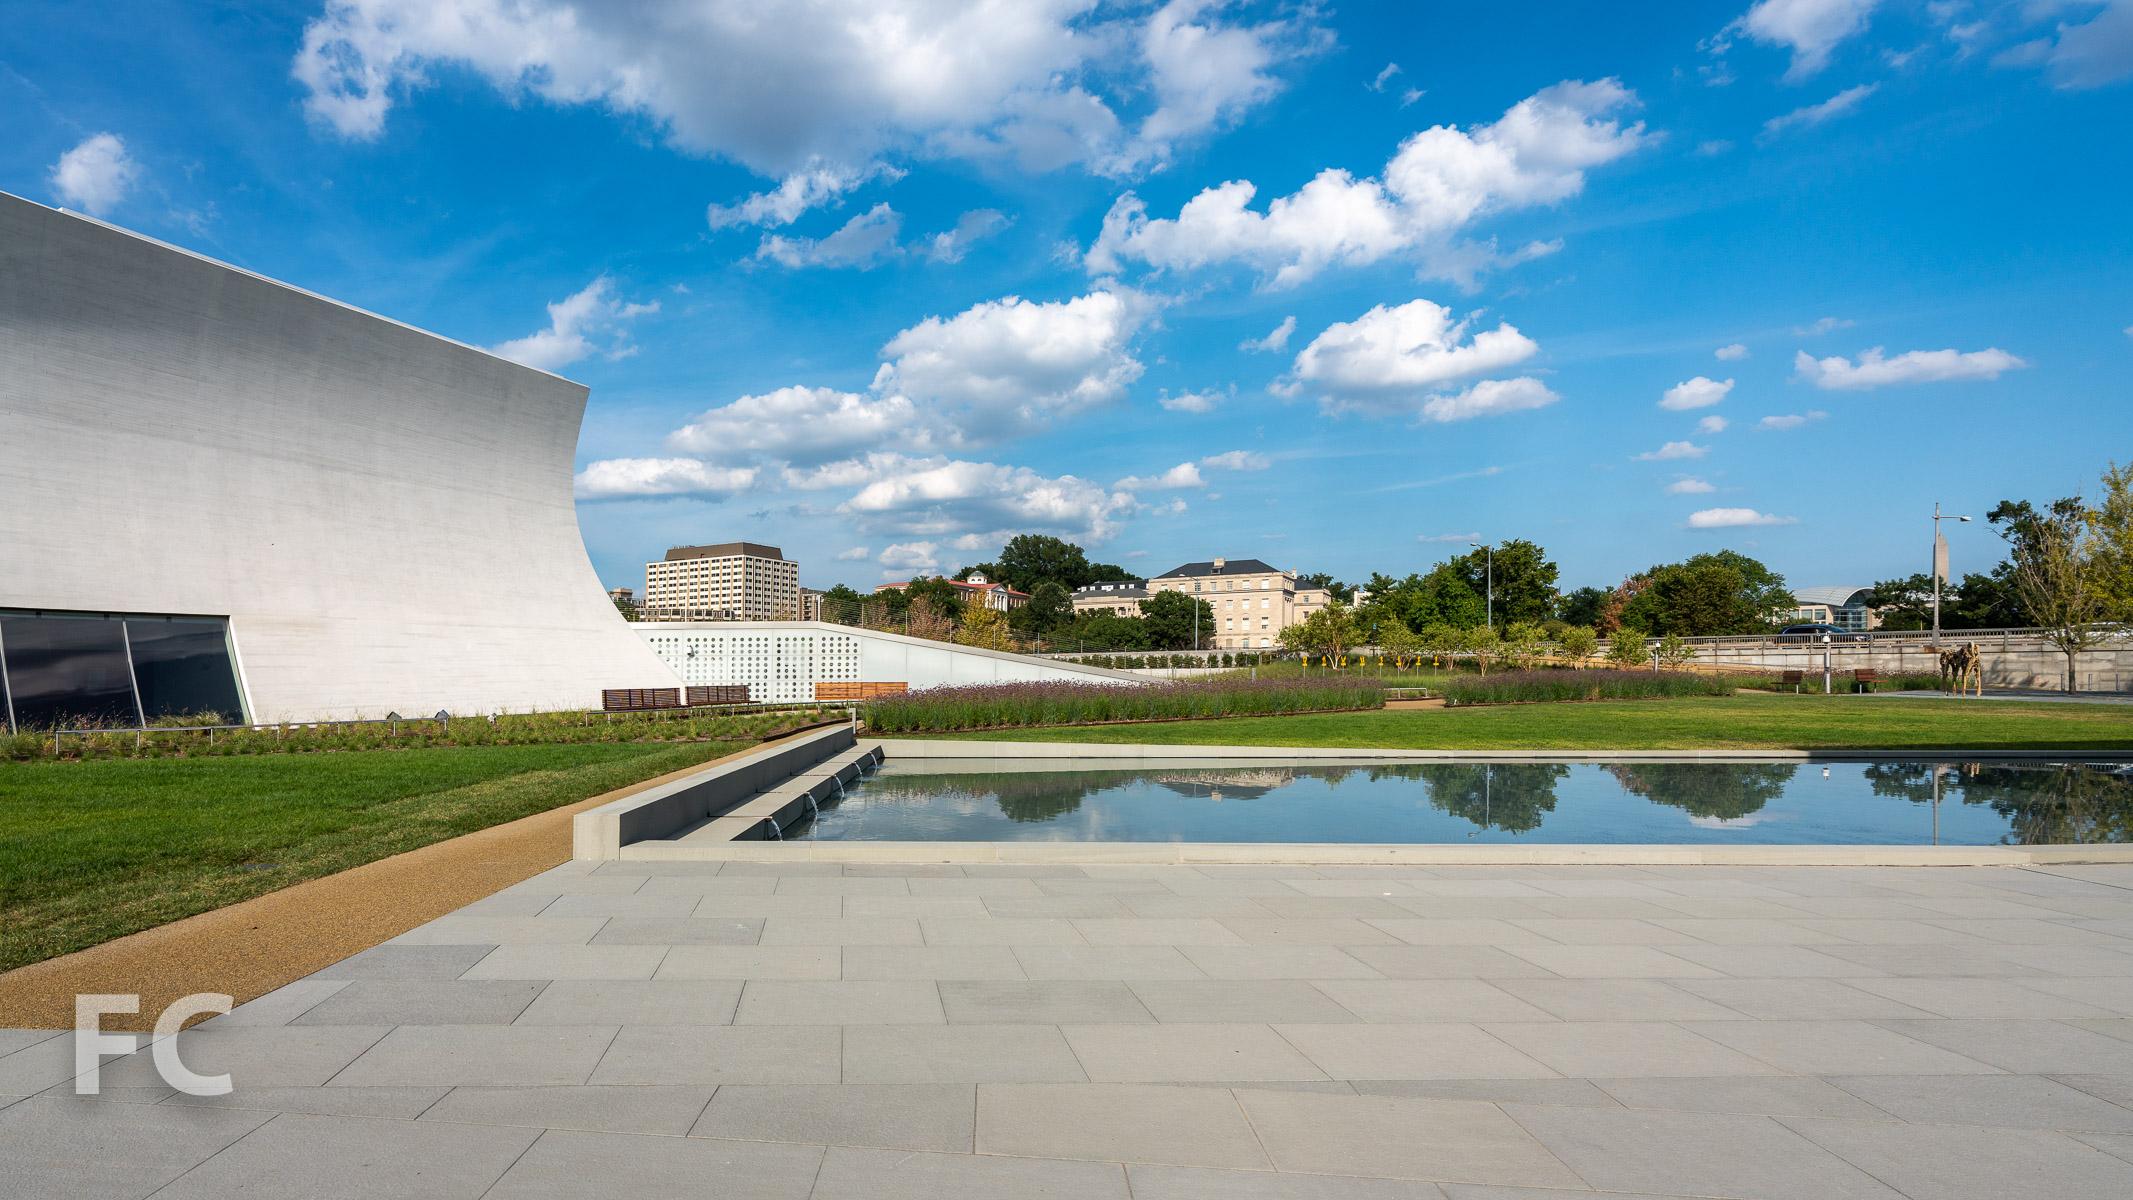 20190831-The Reach at Kennedy Center-DSC05817.jpg